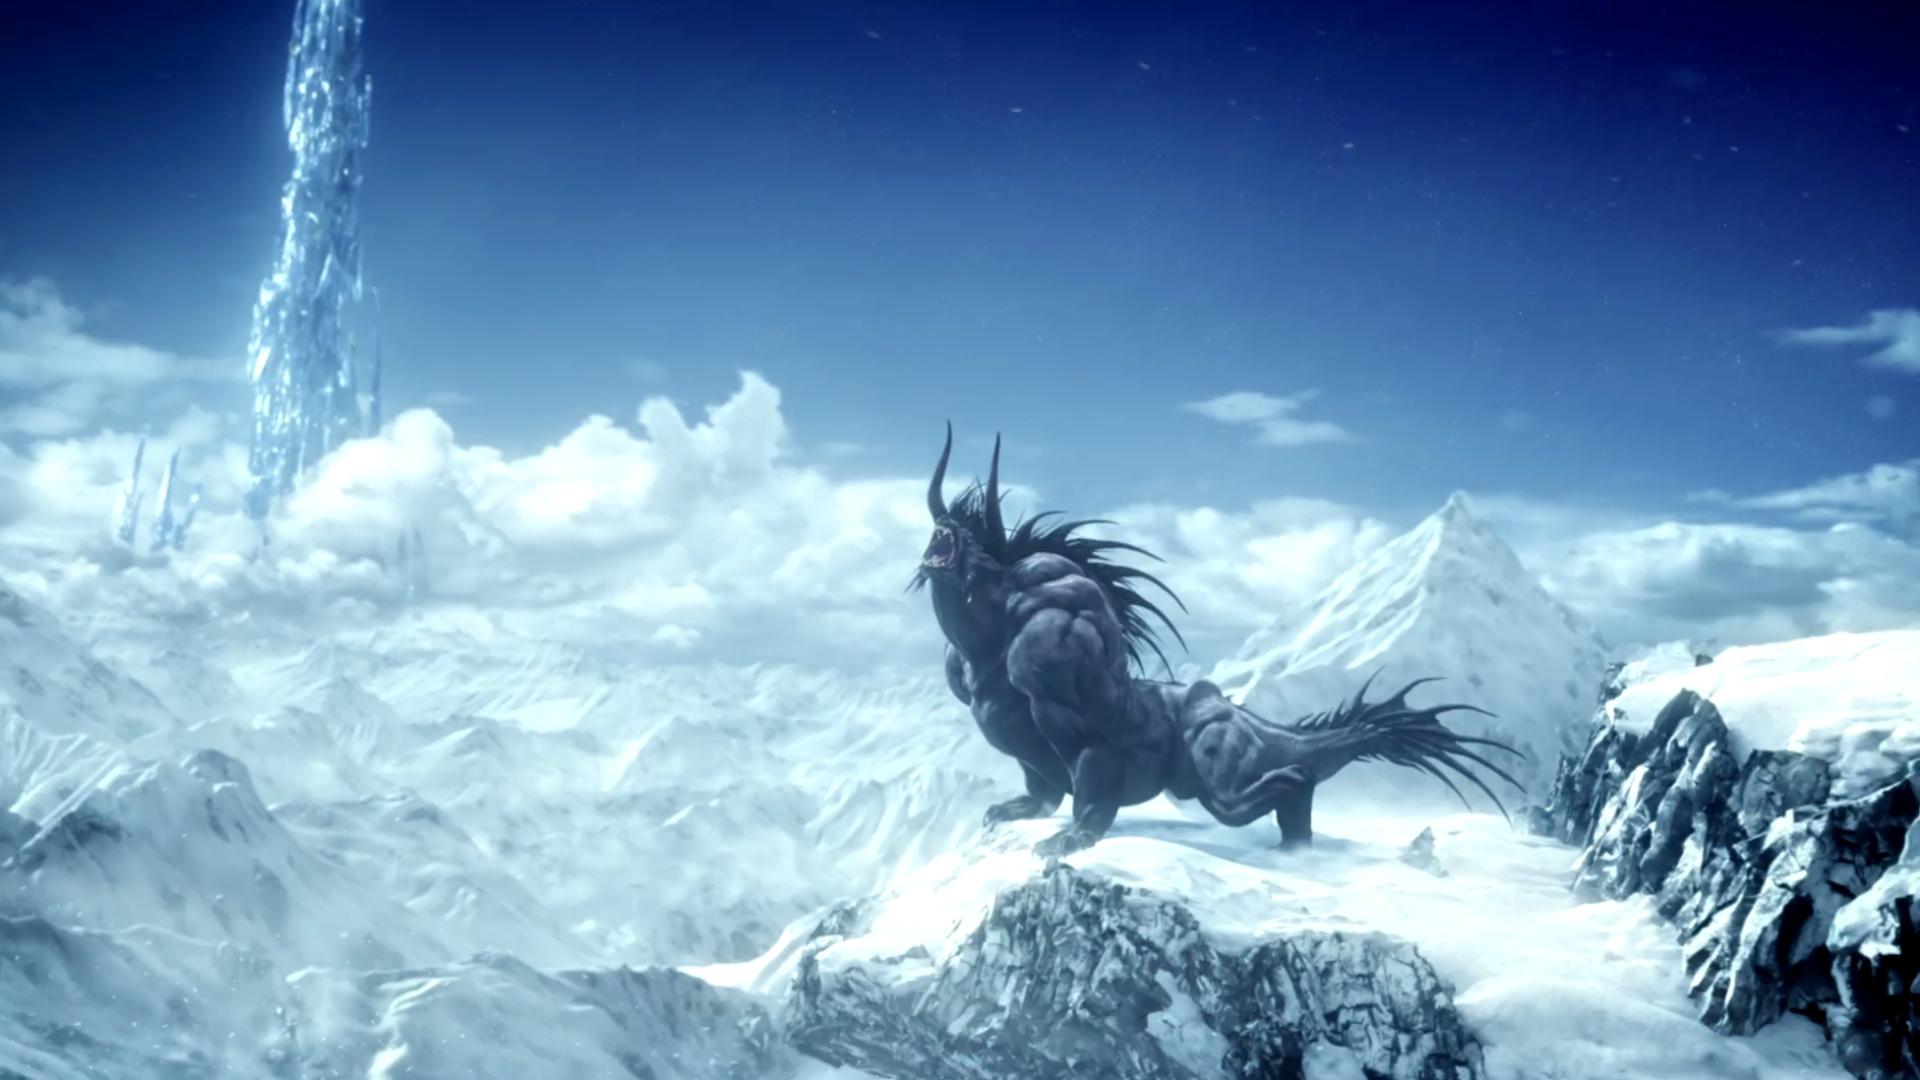 Final Fantasy XIV: A Realm Reborn wallpaper 6